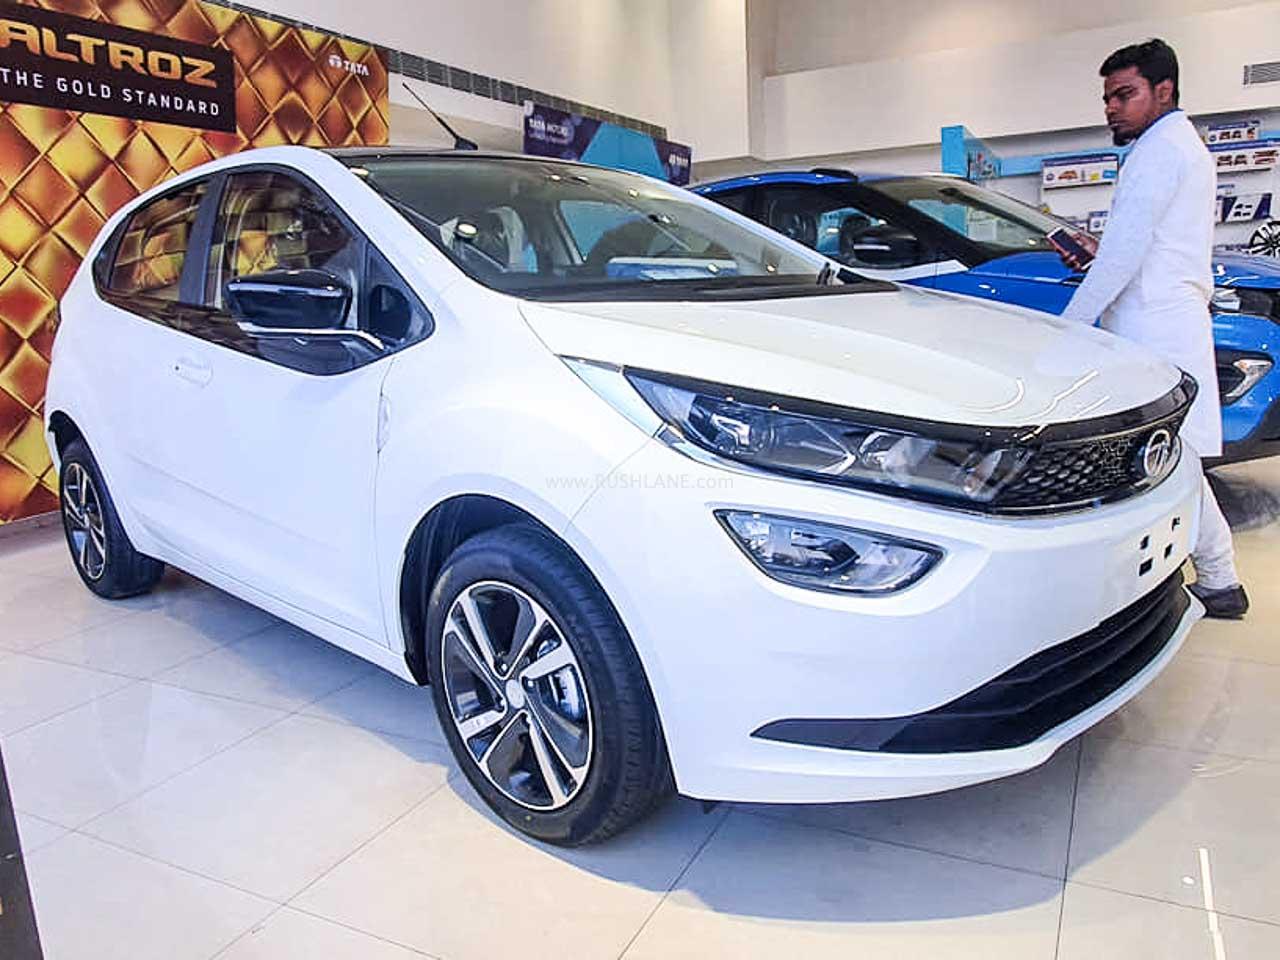 June 2020 Premium Hatch Sales – Baleno leads, Altroz beats i20, Polo